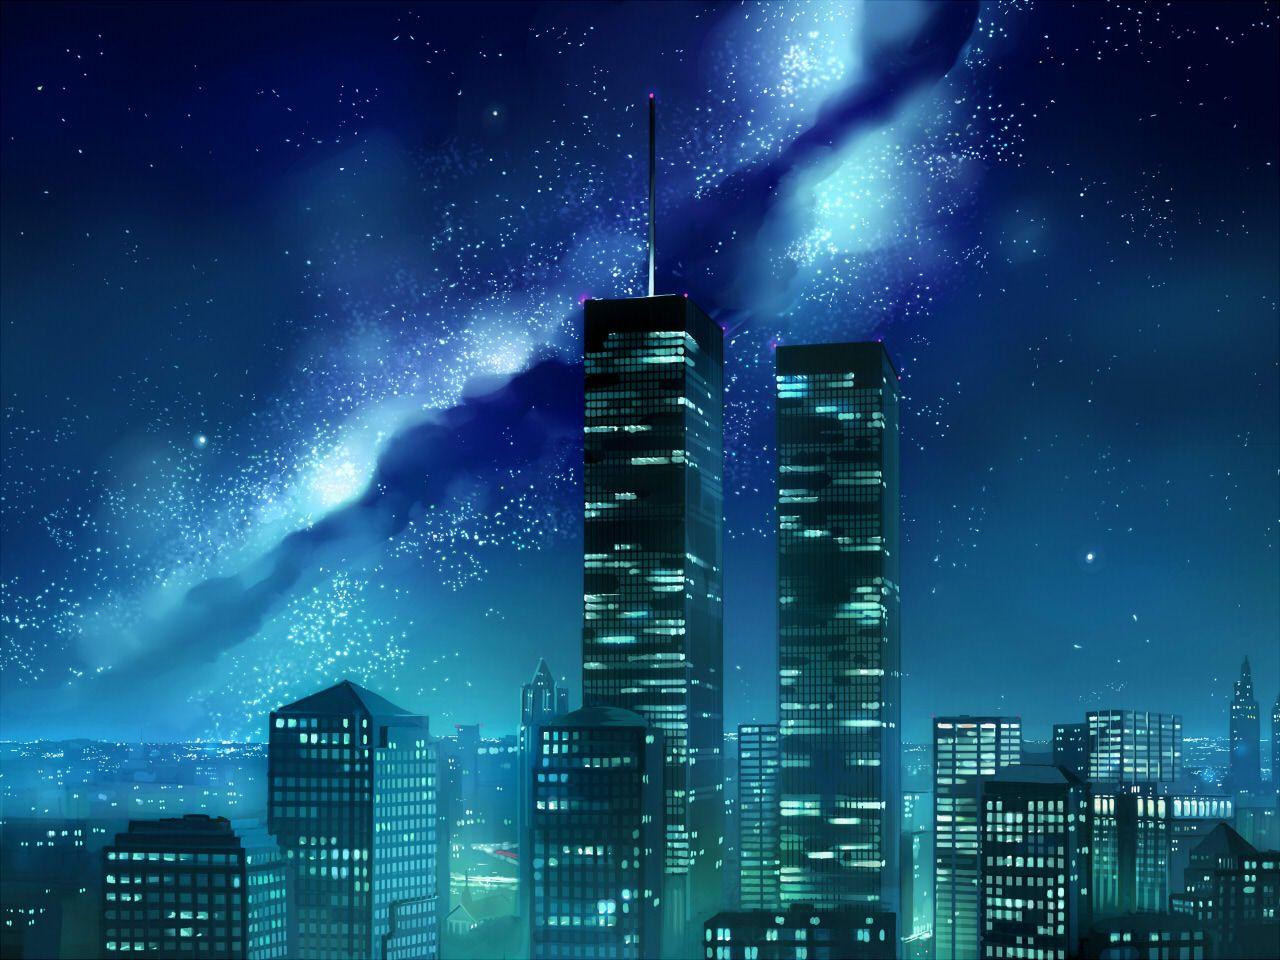 On Any Night Under An Infinite Sky Seo Tatsuya Phong Cảnh